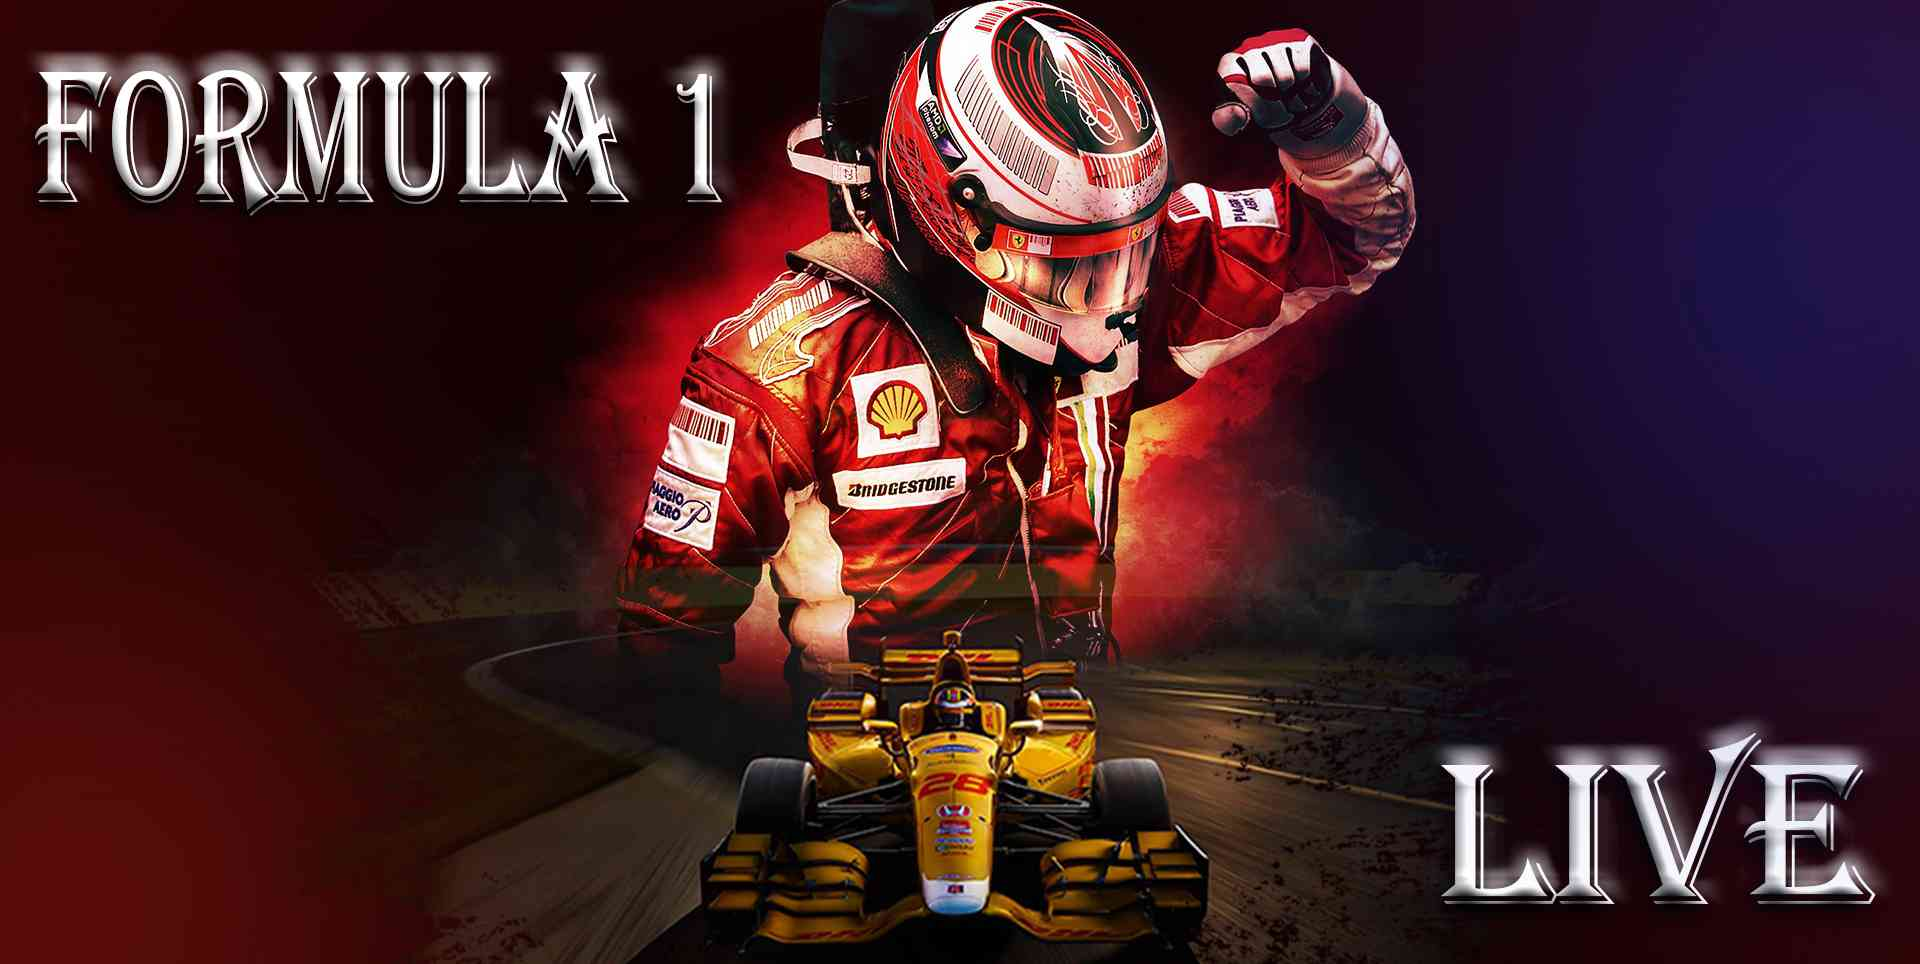 australian-grand-prix-melbourne-gp-circuit-formula-1-racing-live